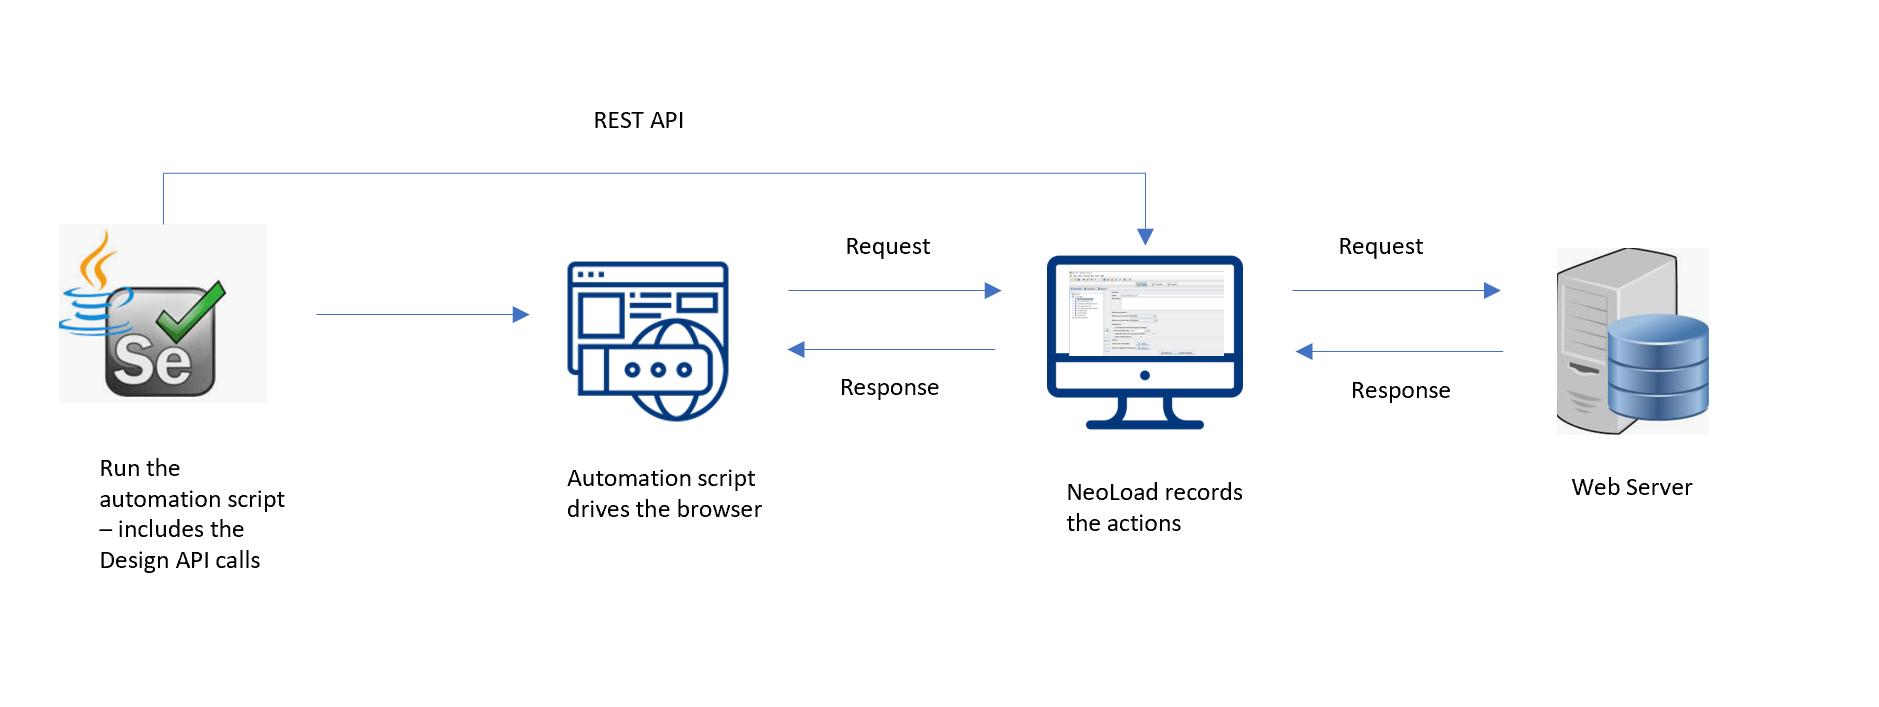 Performance Testing Framework Image